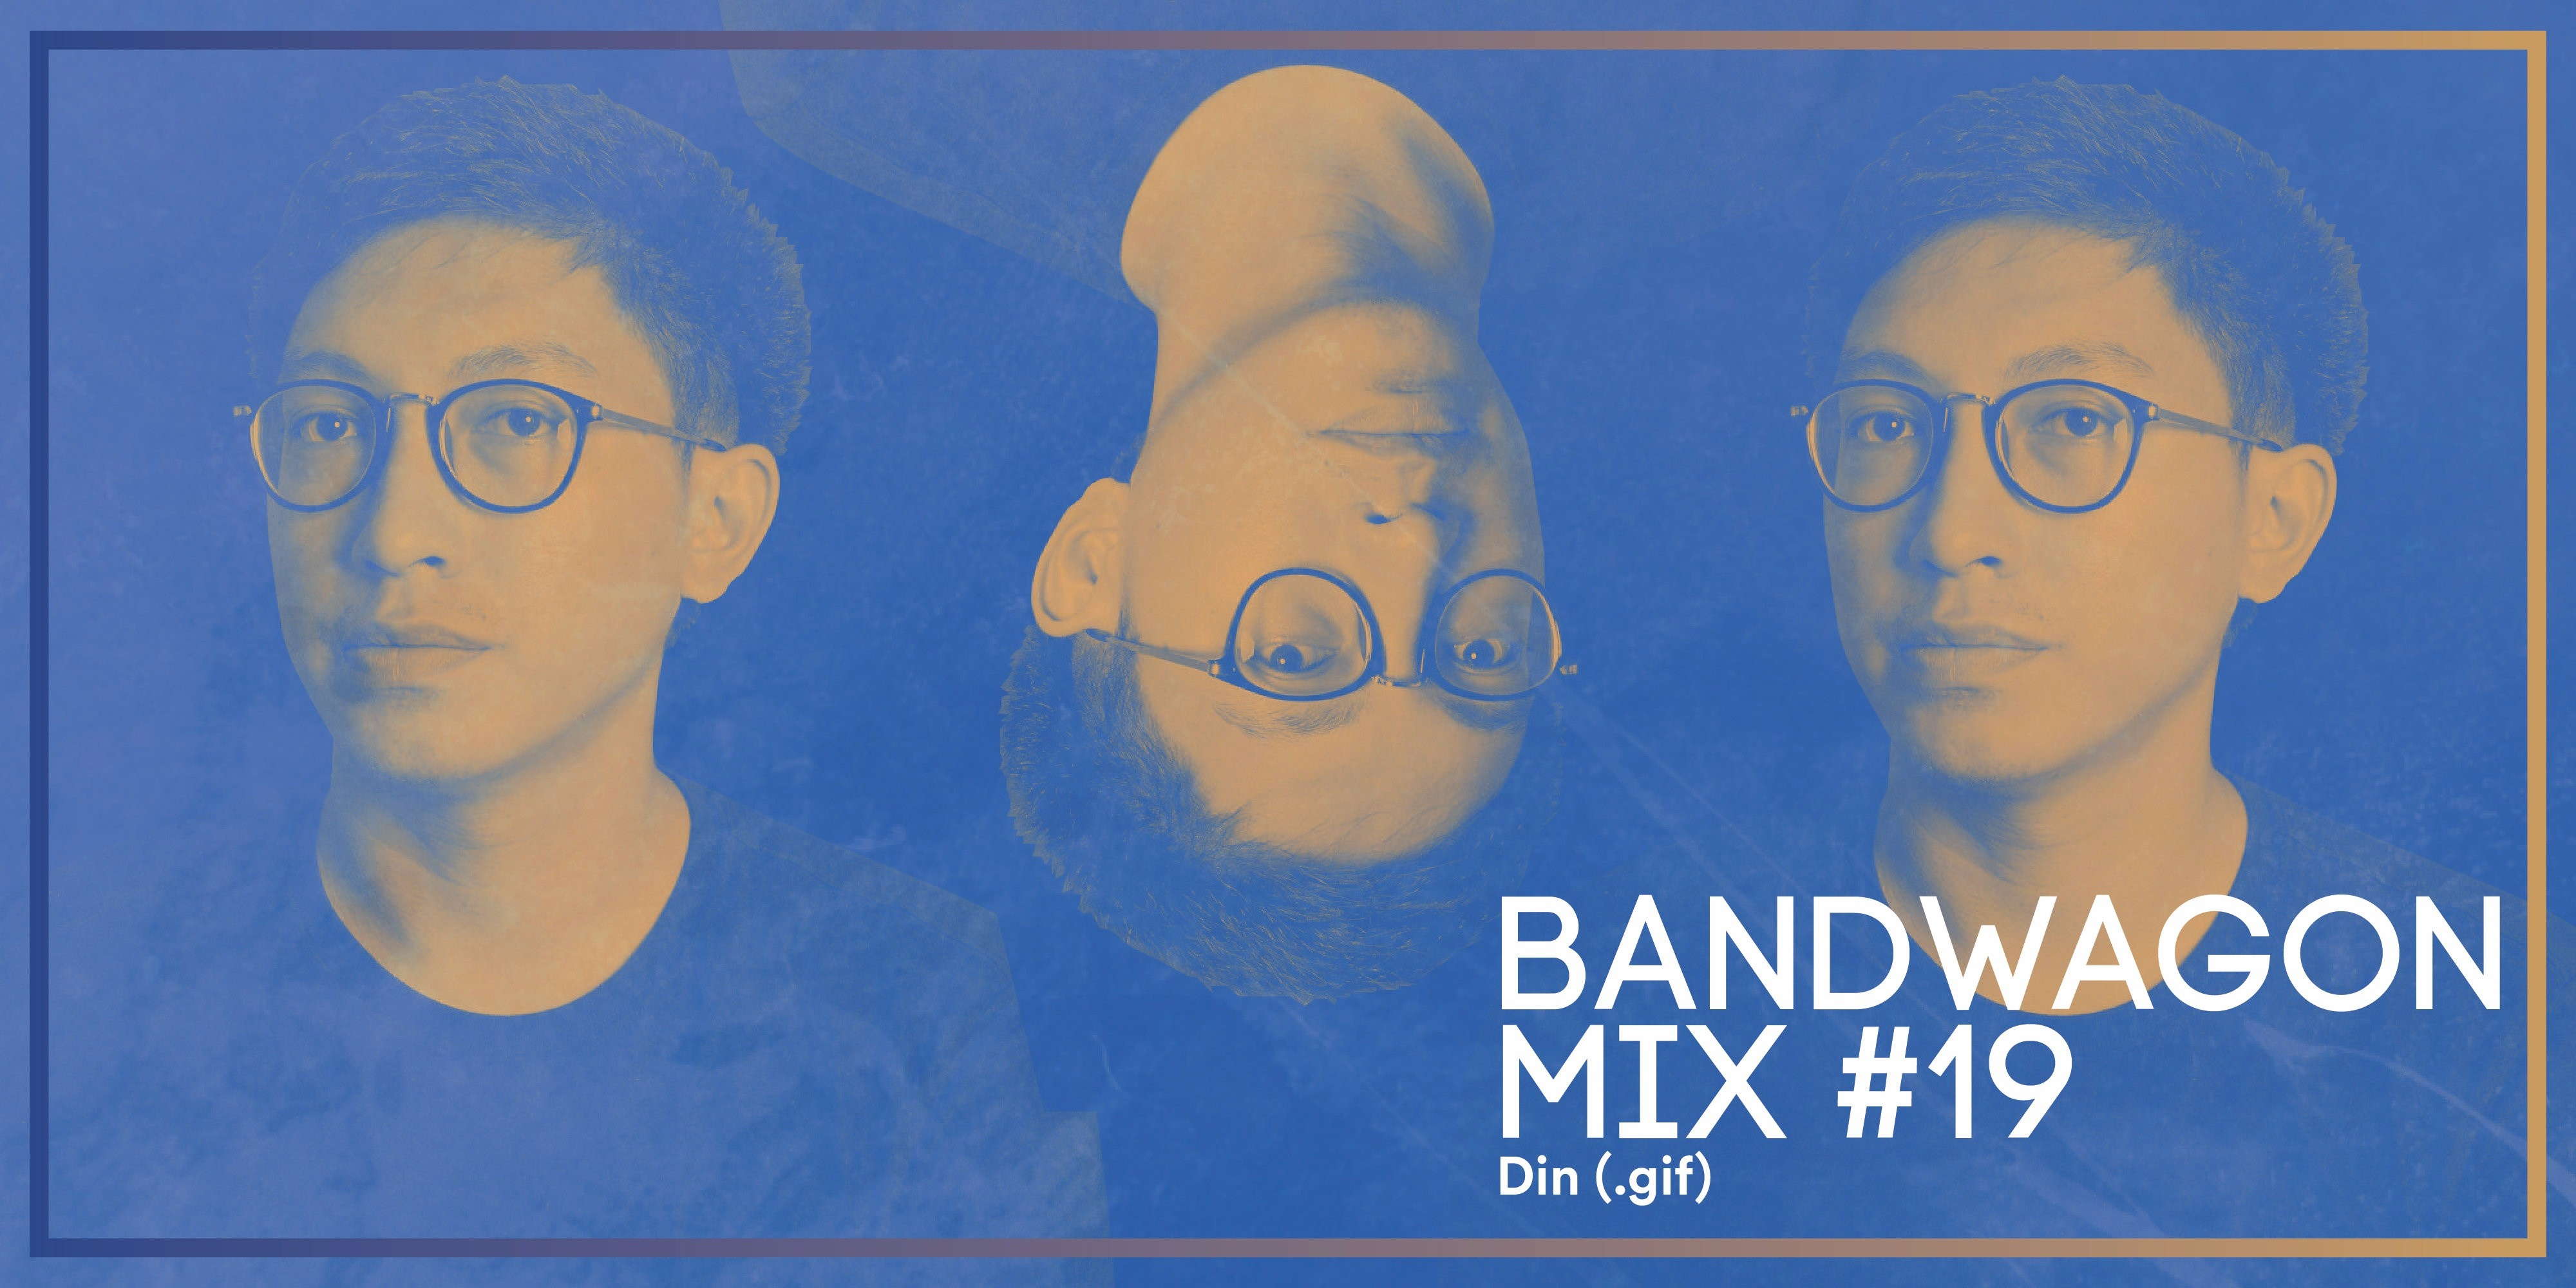 Bandwagon Mix #19: Din (.gif)